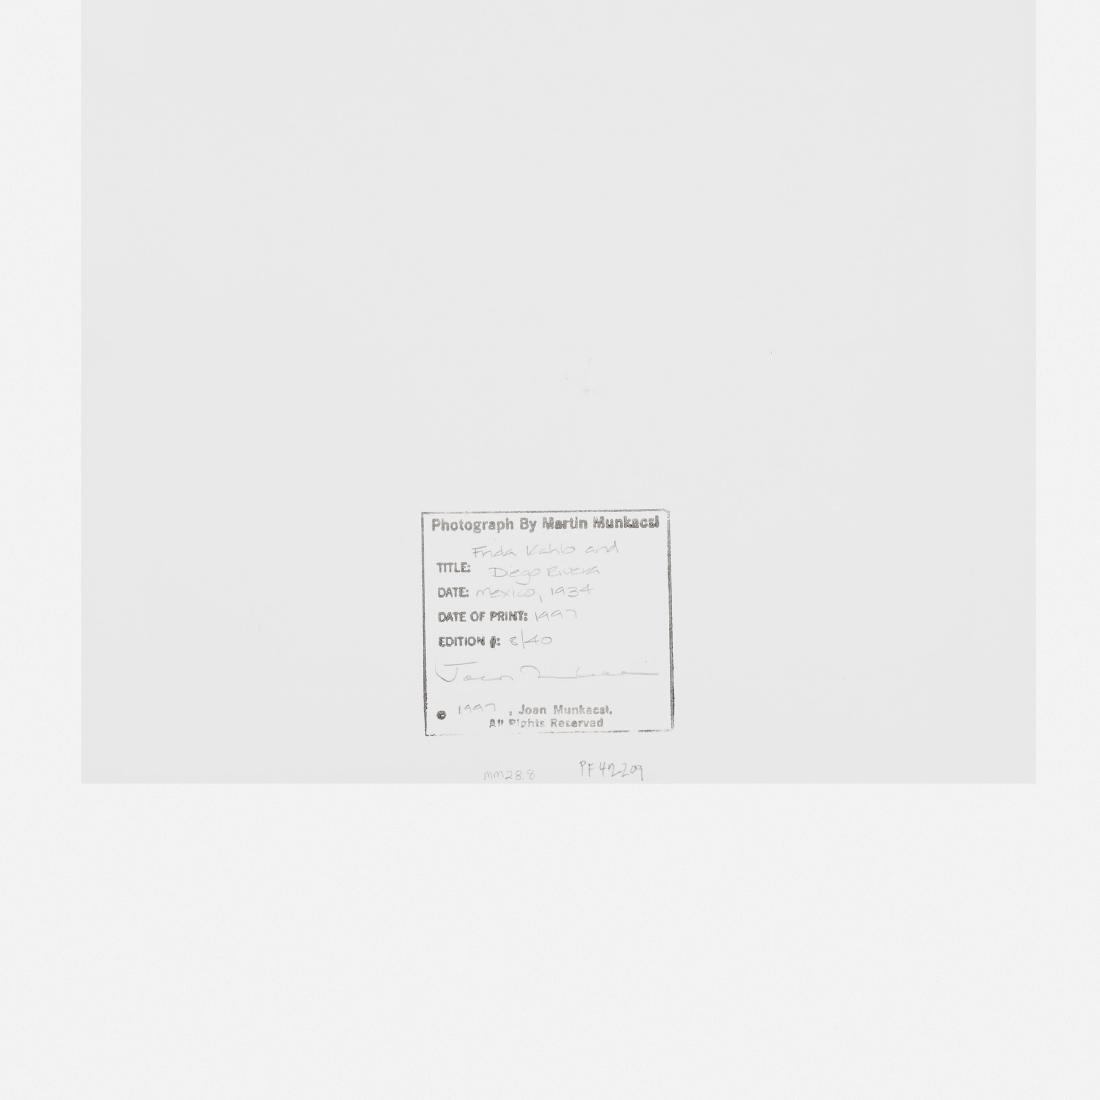 Martin Munkacsi, Frida Kahlo and Diego Rivera - 2